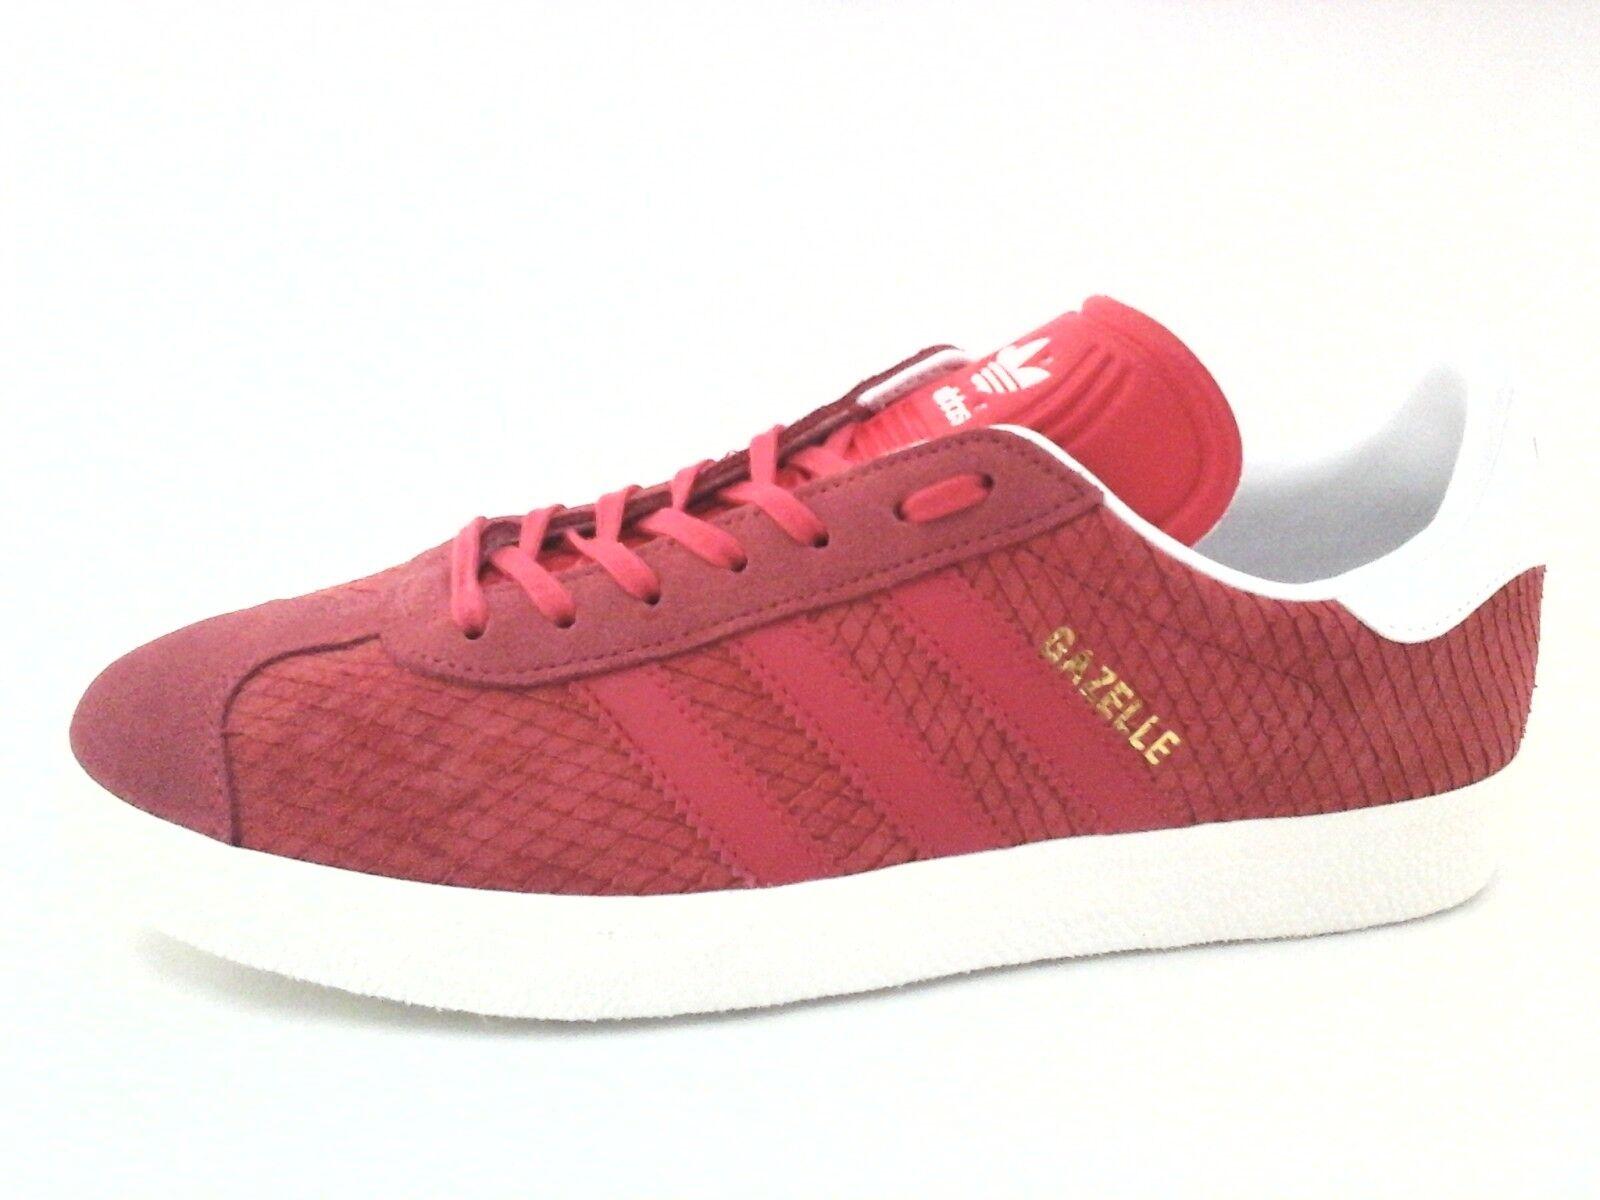 7a6525c8fc7d3 ... Adidas BB5174 Gazelle Women s Reptile Reptile Reptile Suede Shoes  Sneakers Coral US 9  3 b61d26 ...